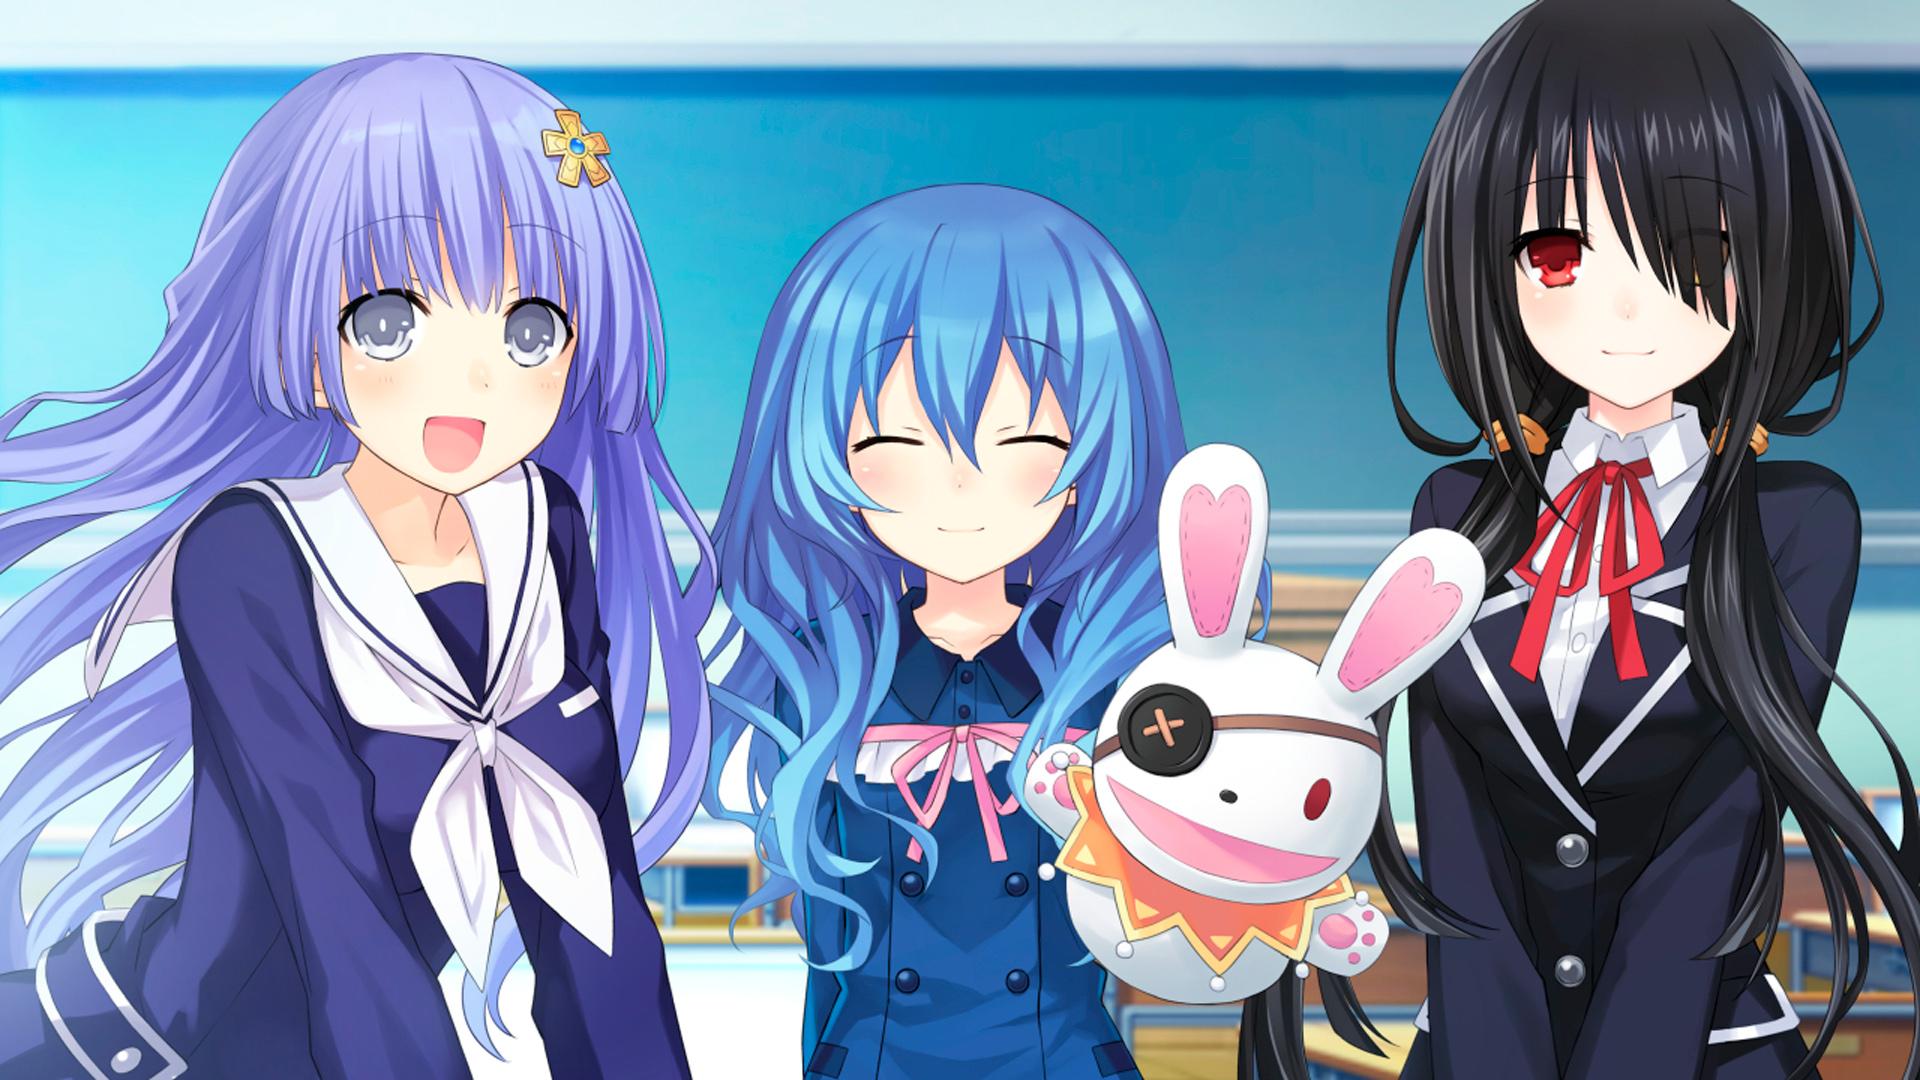 Steam Workshop Date A Live Tsunako Cg Art